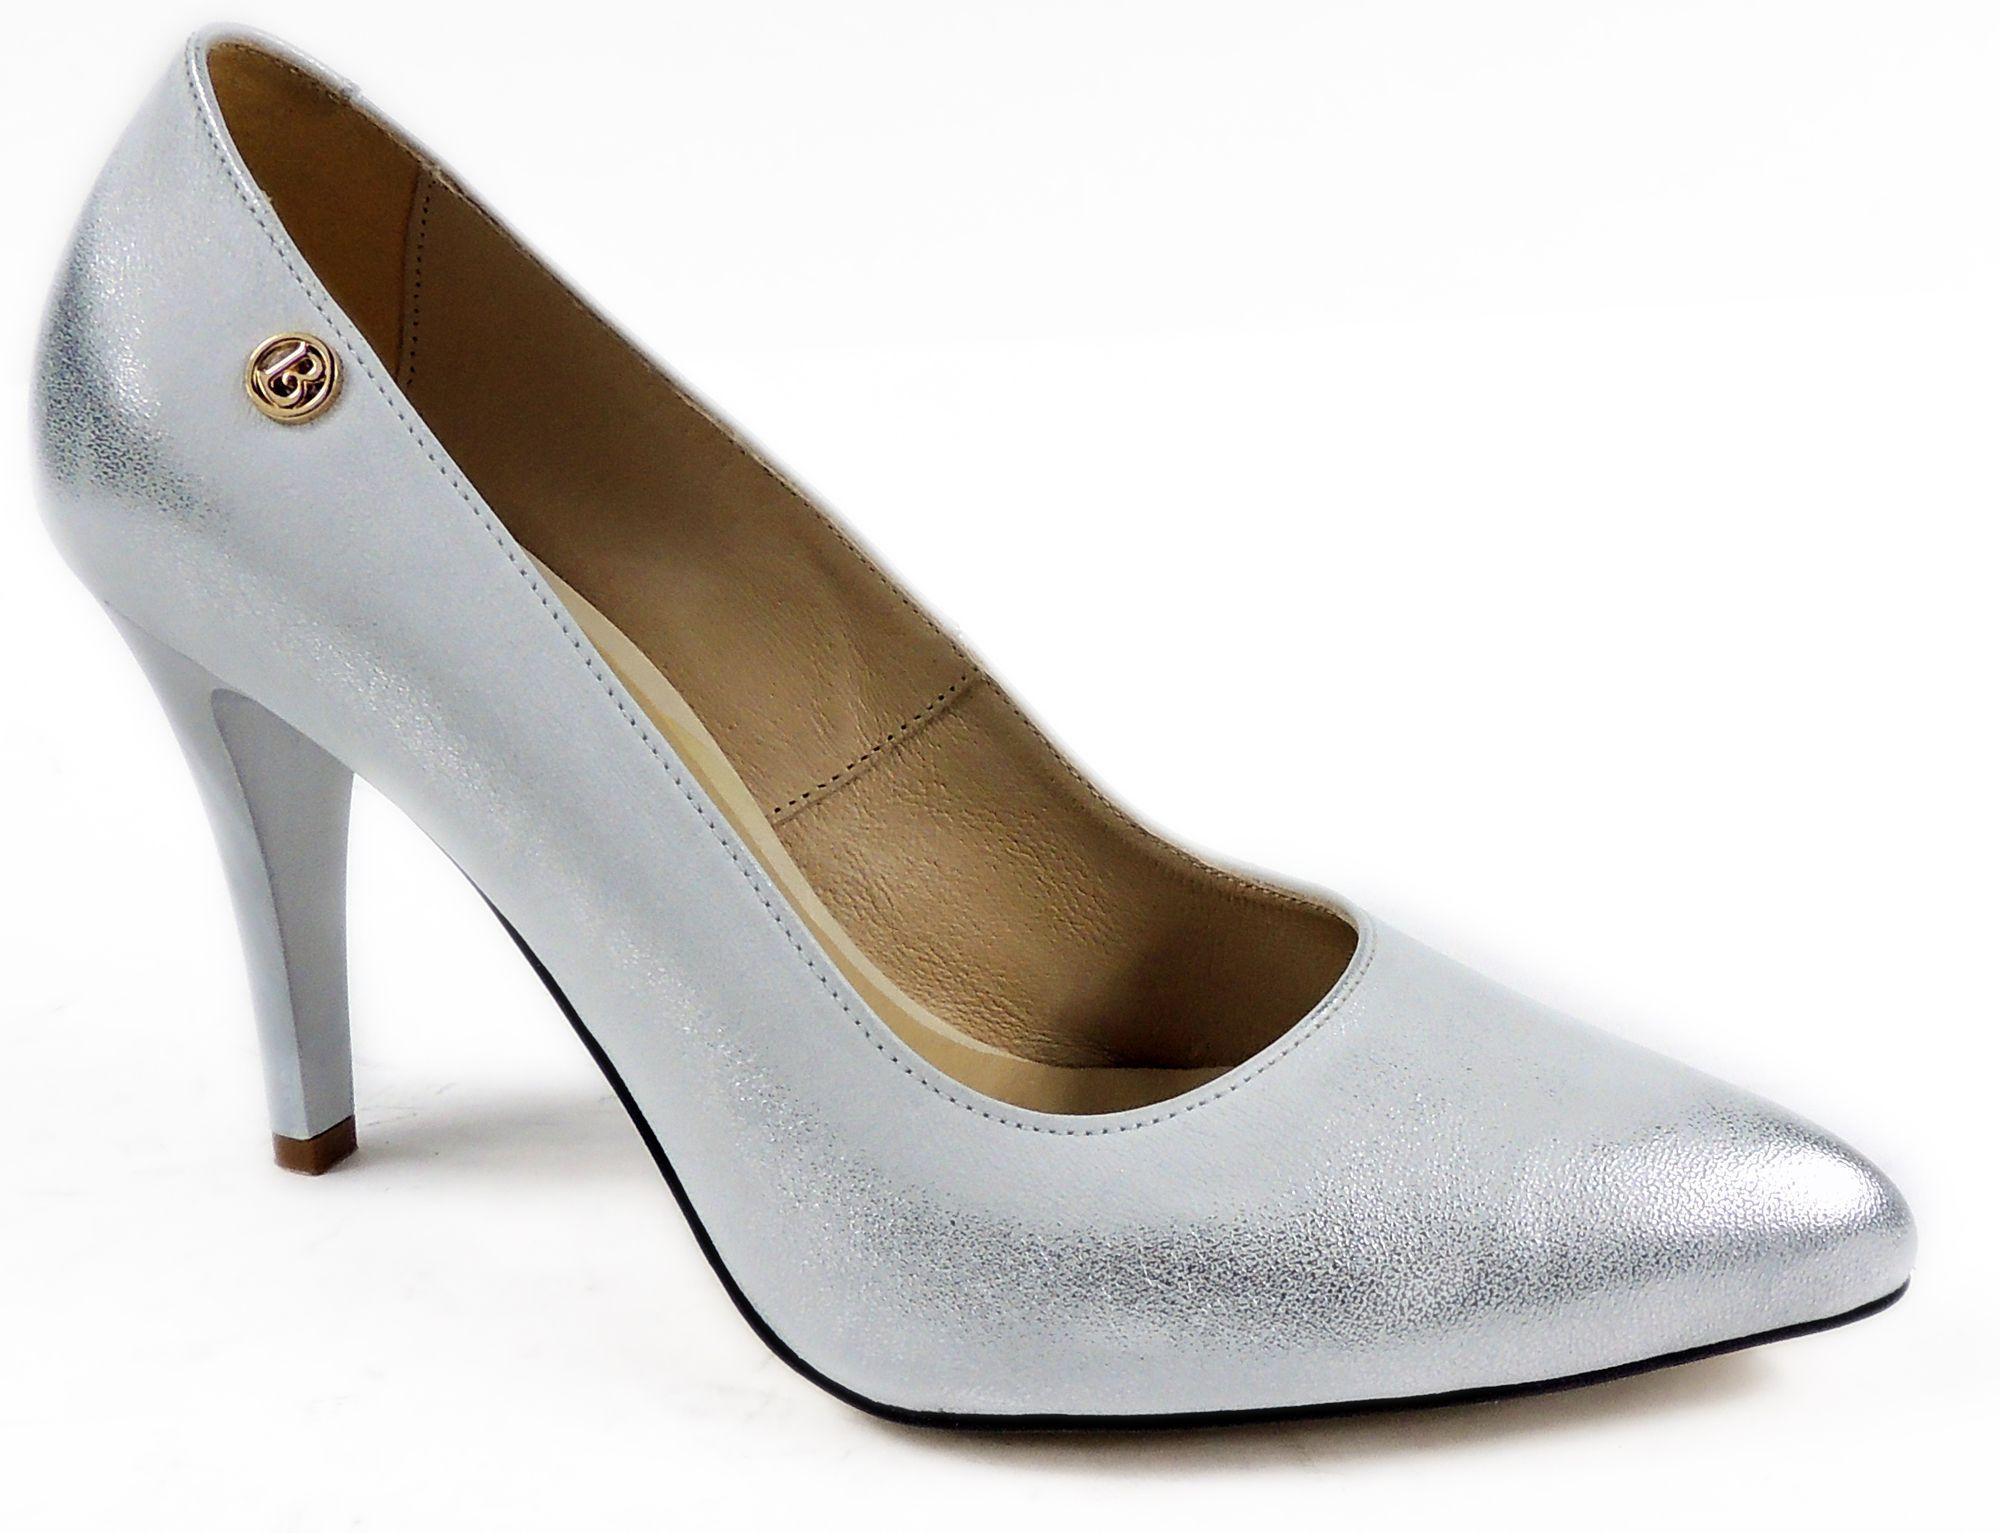 Szpilki 0230380d Wieczorowe Czolenka Heels Pumps Shoes